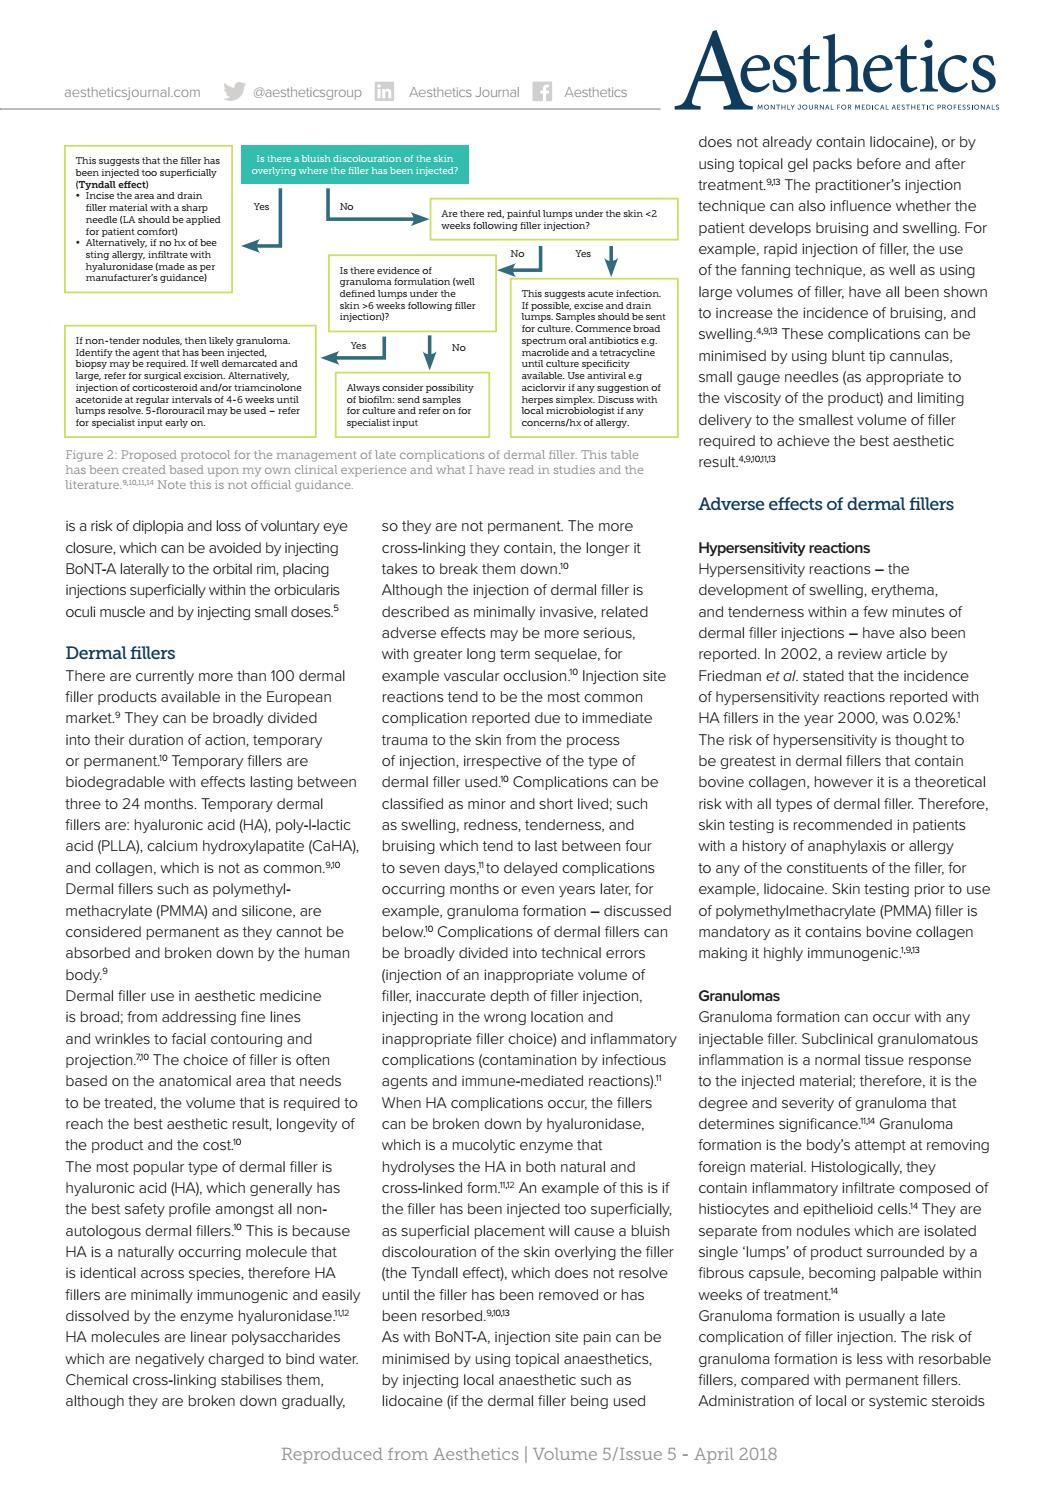 Aesthetics April 2018 by Aesthetics Journal - issuu